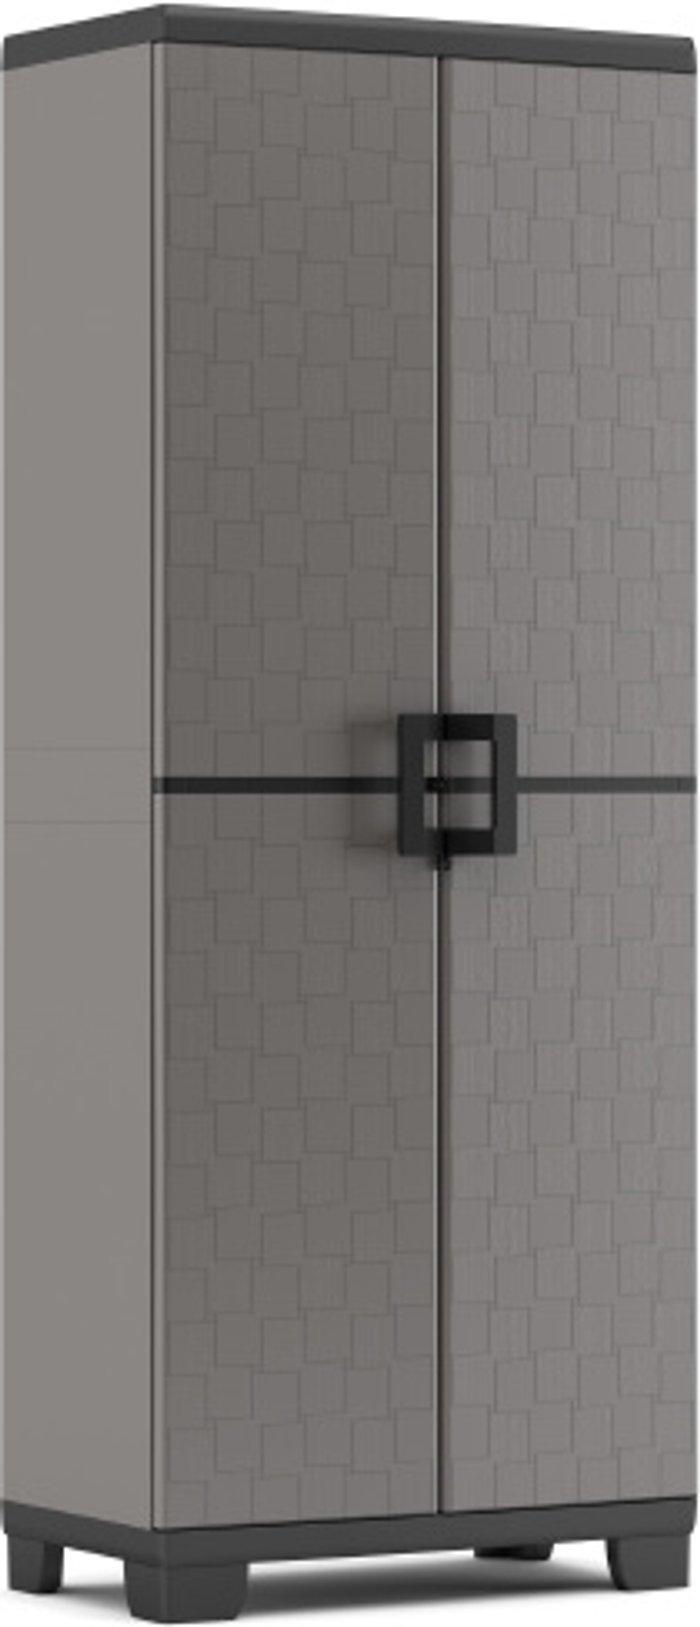 The Range Up Utility Cabinet - Grey